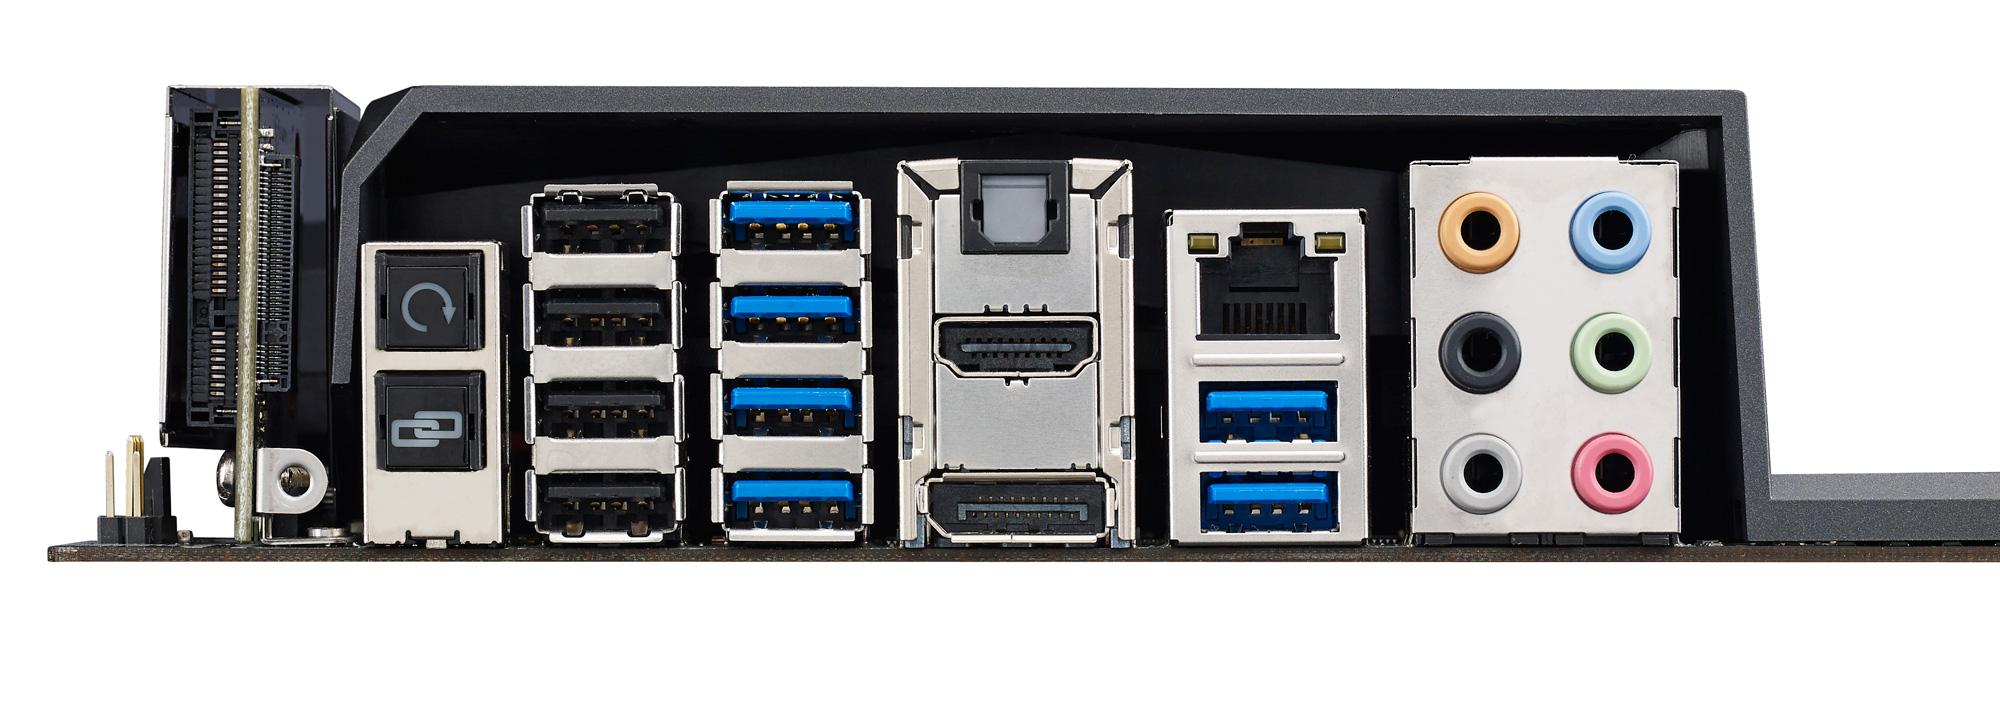 asus-z87-rog-maximus-vi-formula-gaming-motherboard-3.jpg